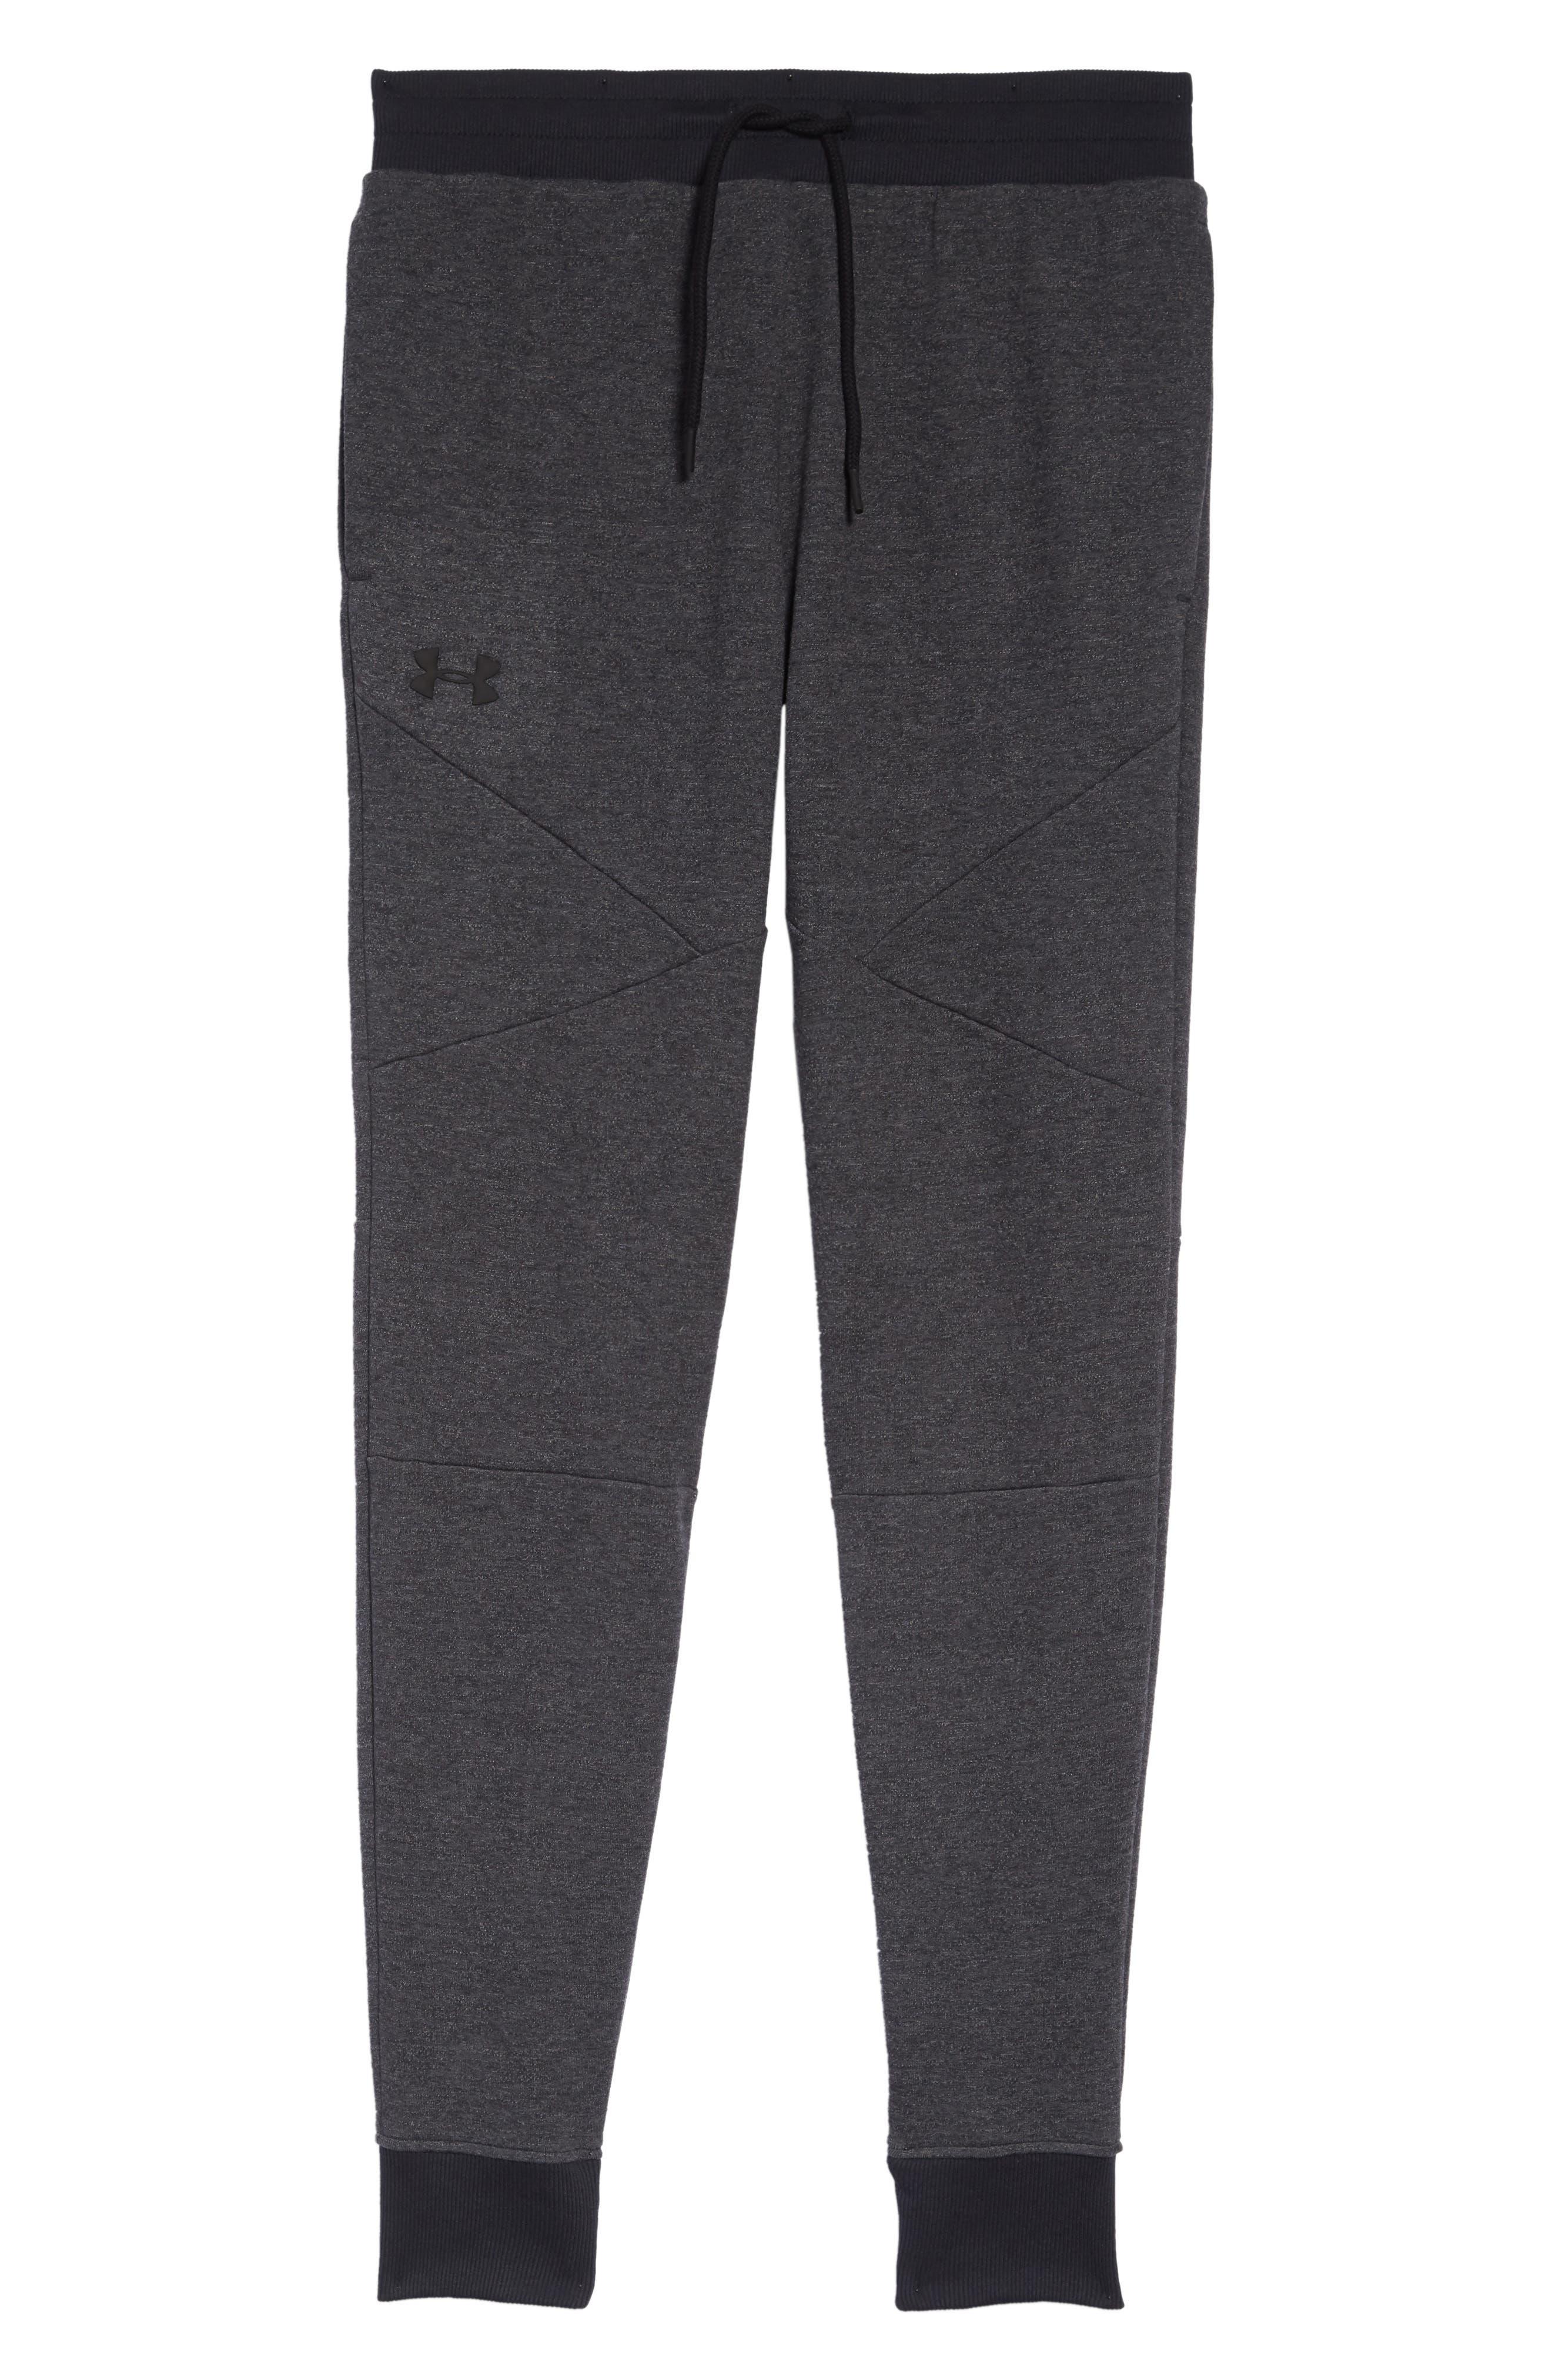 UNDER ARMOUR,                             Unstoppable Double Knit Jogger Pants,                             Alternate thumbnail 6, color,                             001